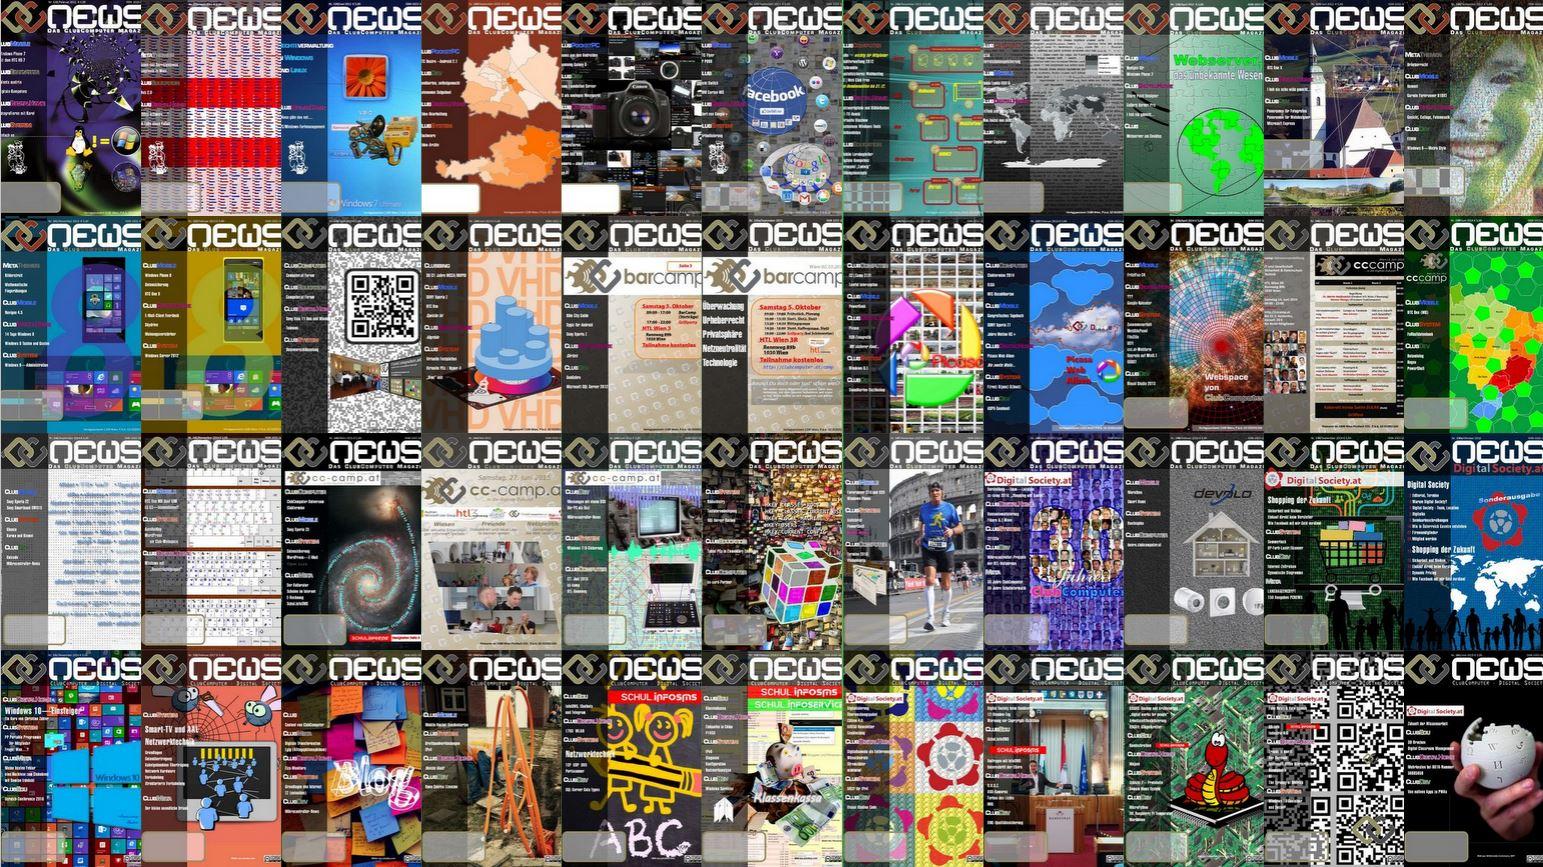 PCNEWS-Links